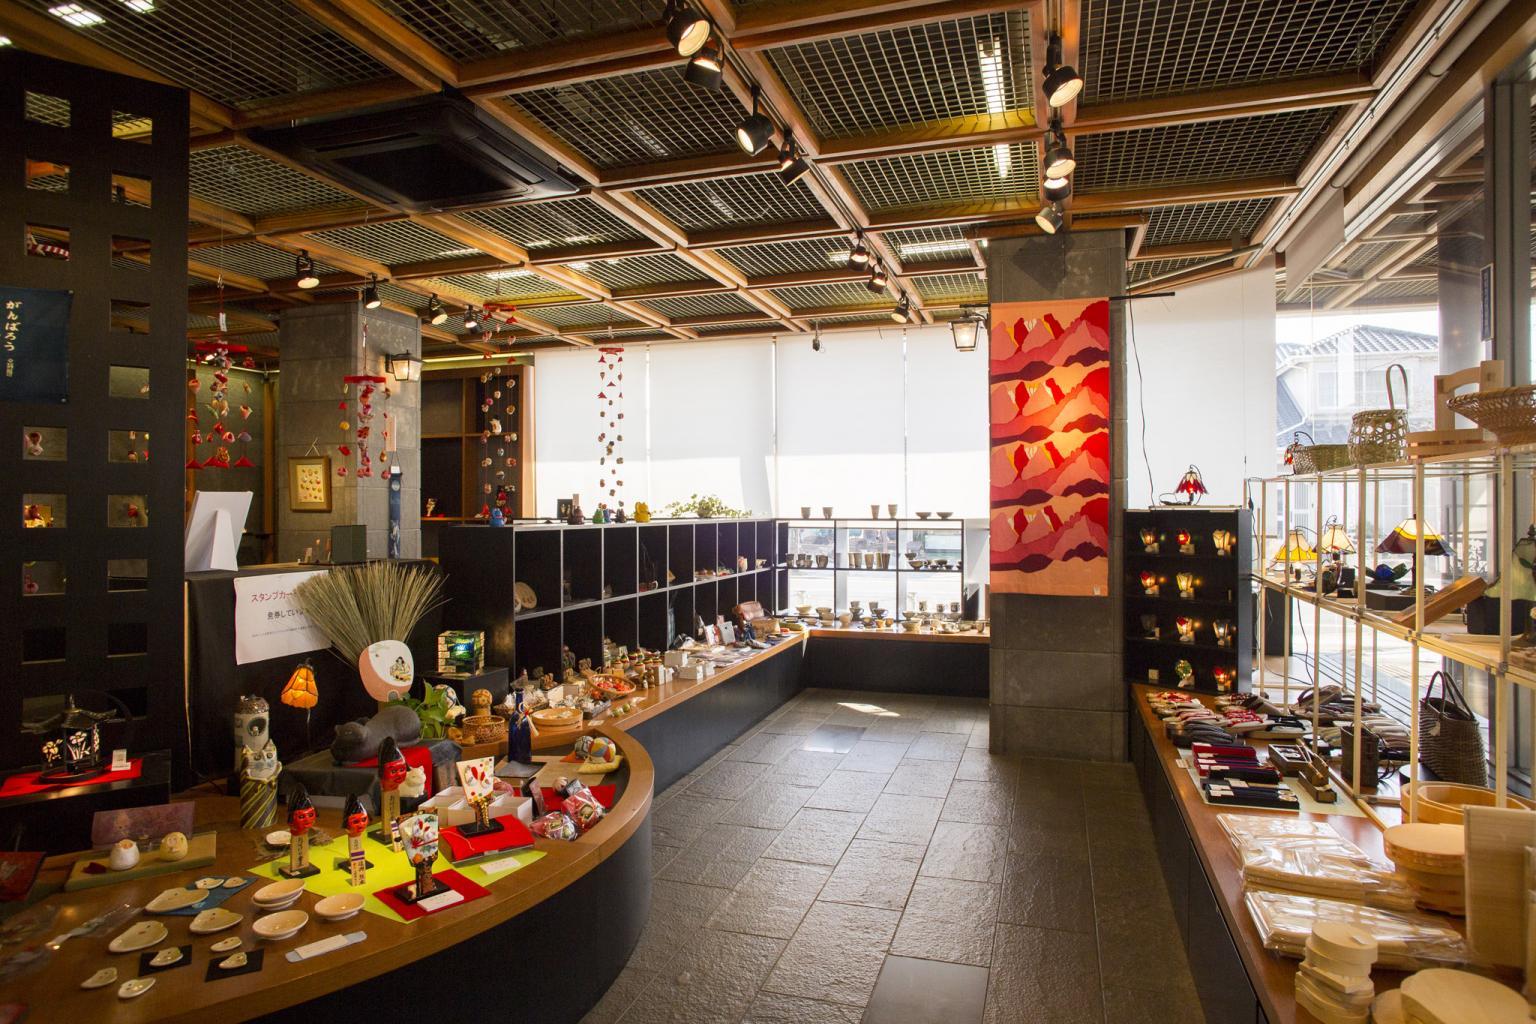 Kumamoto City Handicrafts Promotion Center Sightseeing Kumamoto